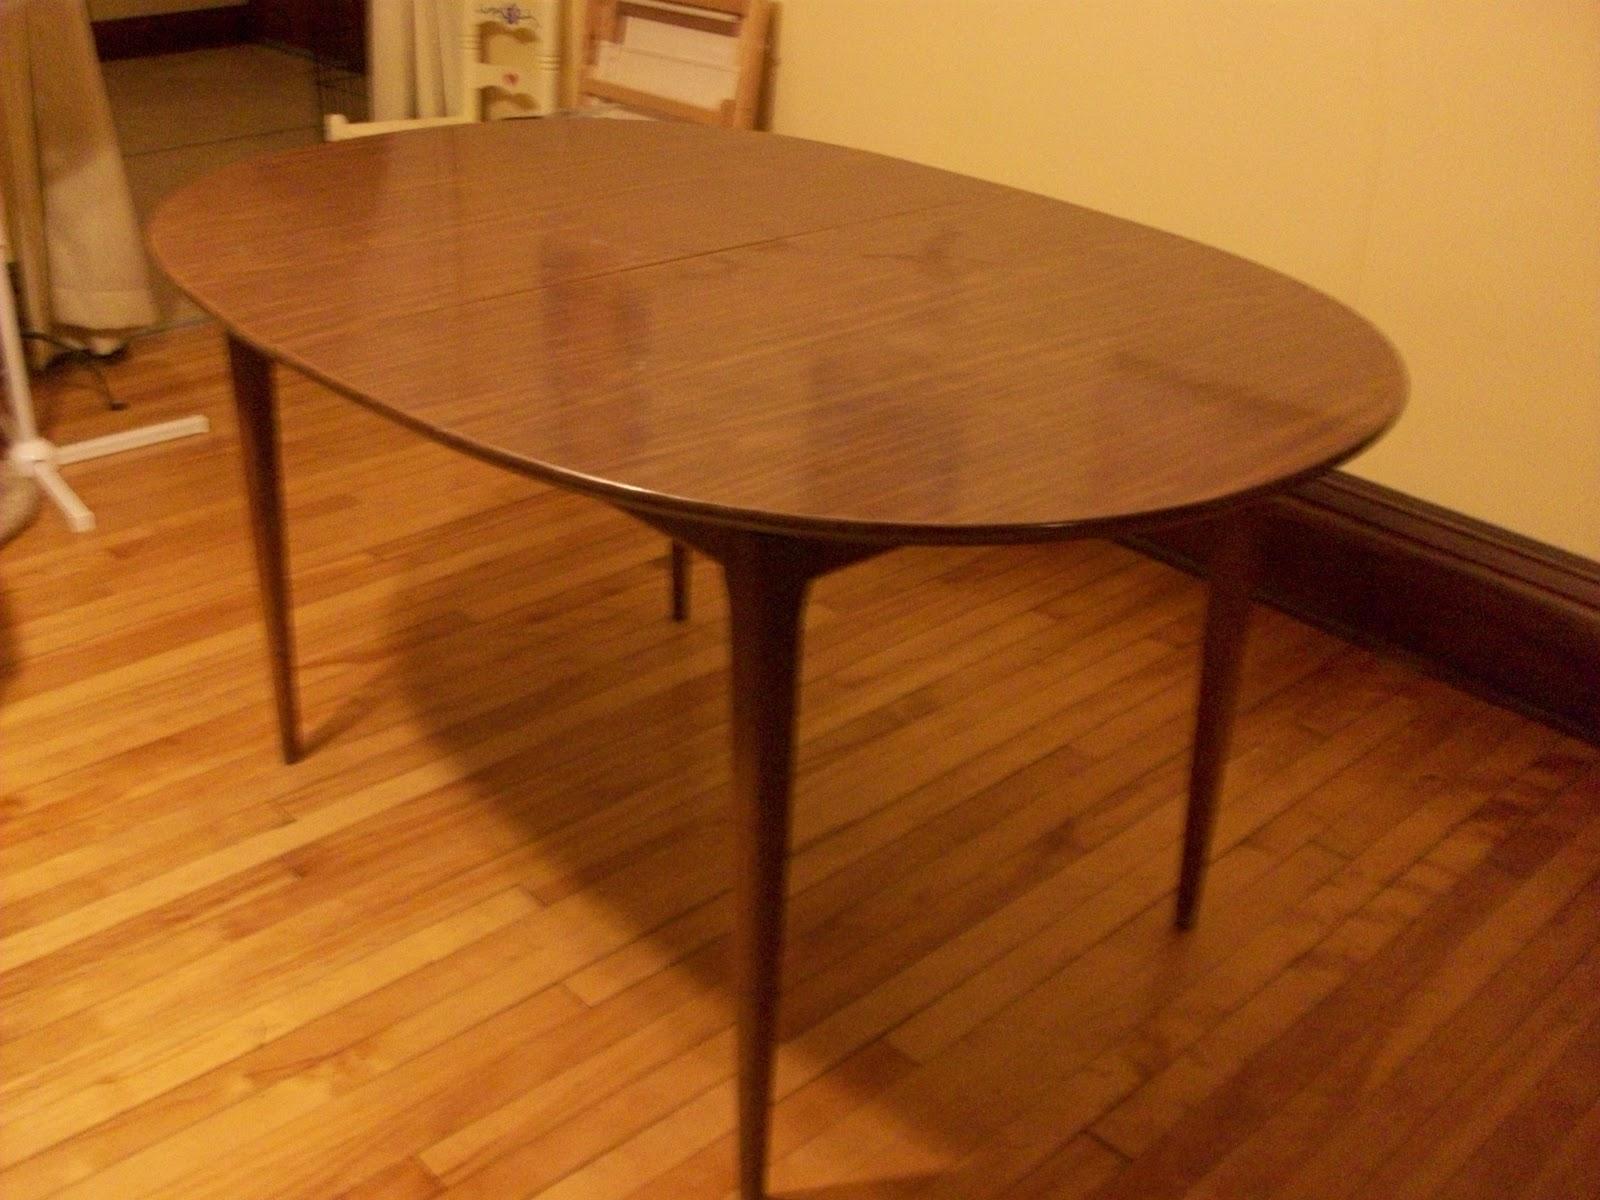 Con Sofas Designs cs Extendable dining table : 1007129 from consofasdesigns.blogspot.com size 1600 x 1200 jpeg 248kB